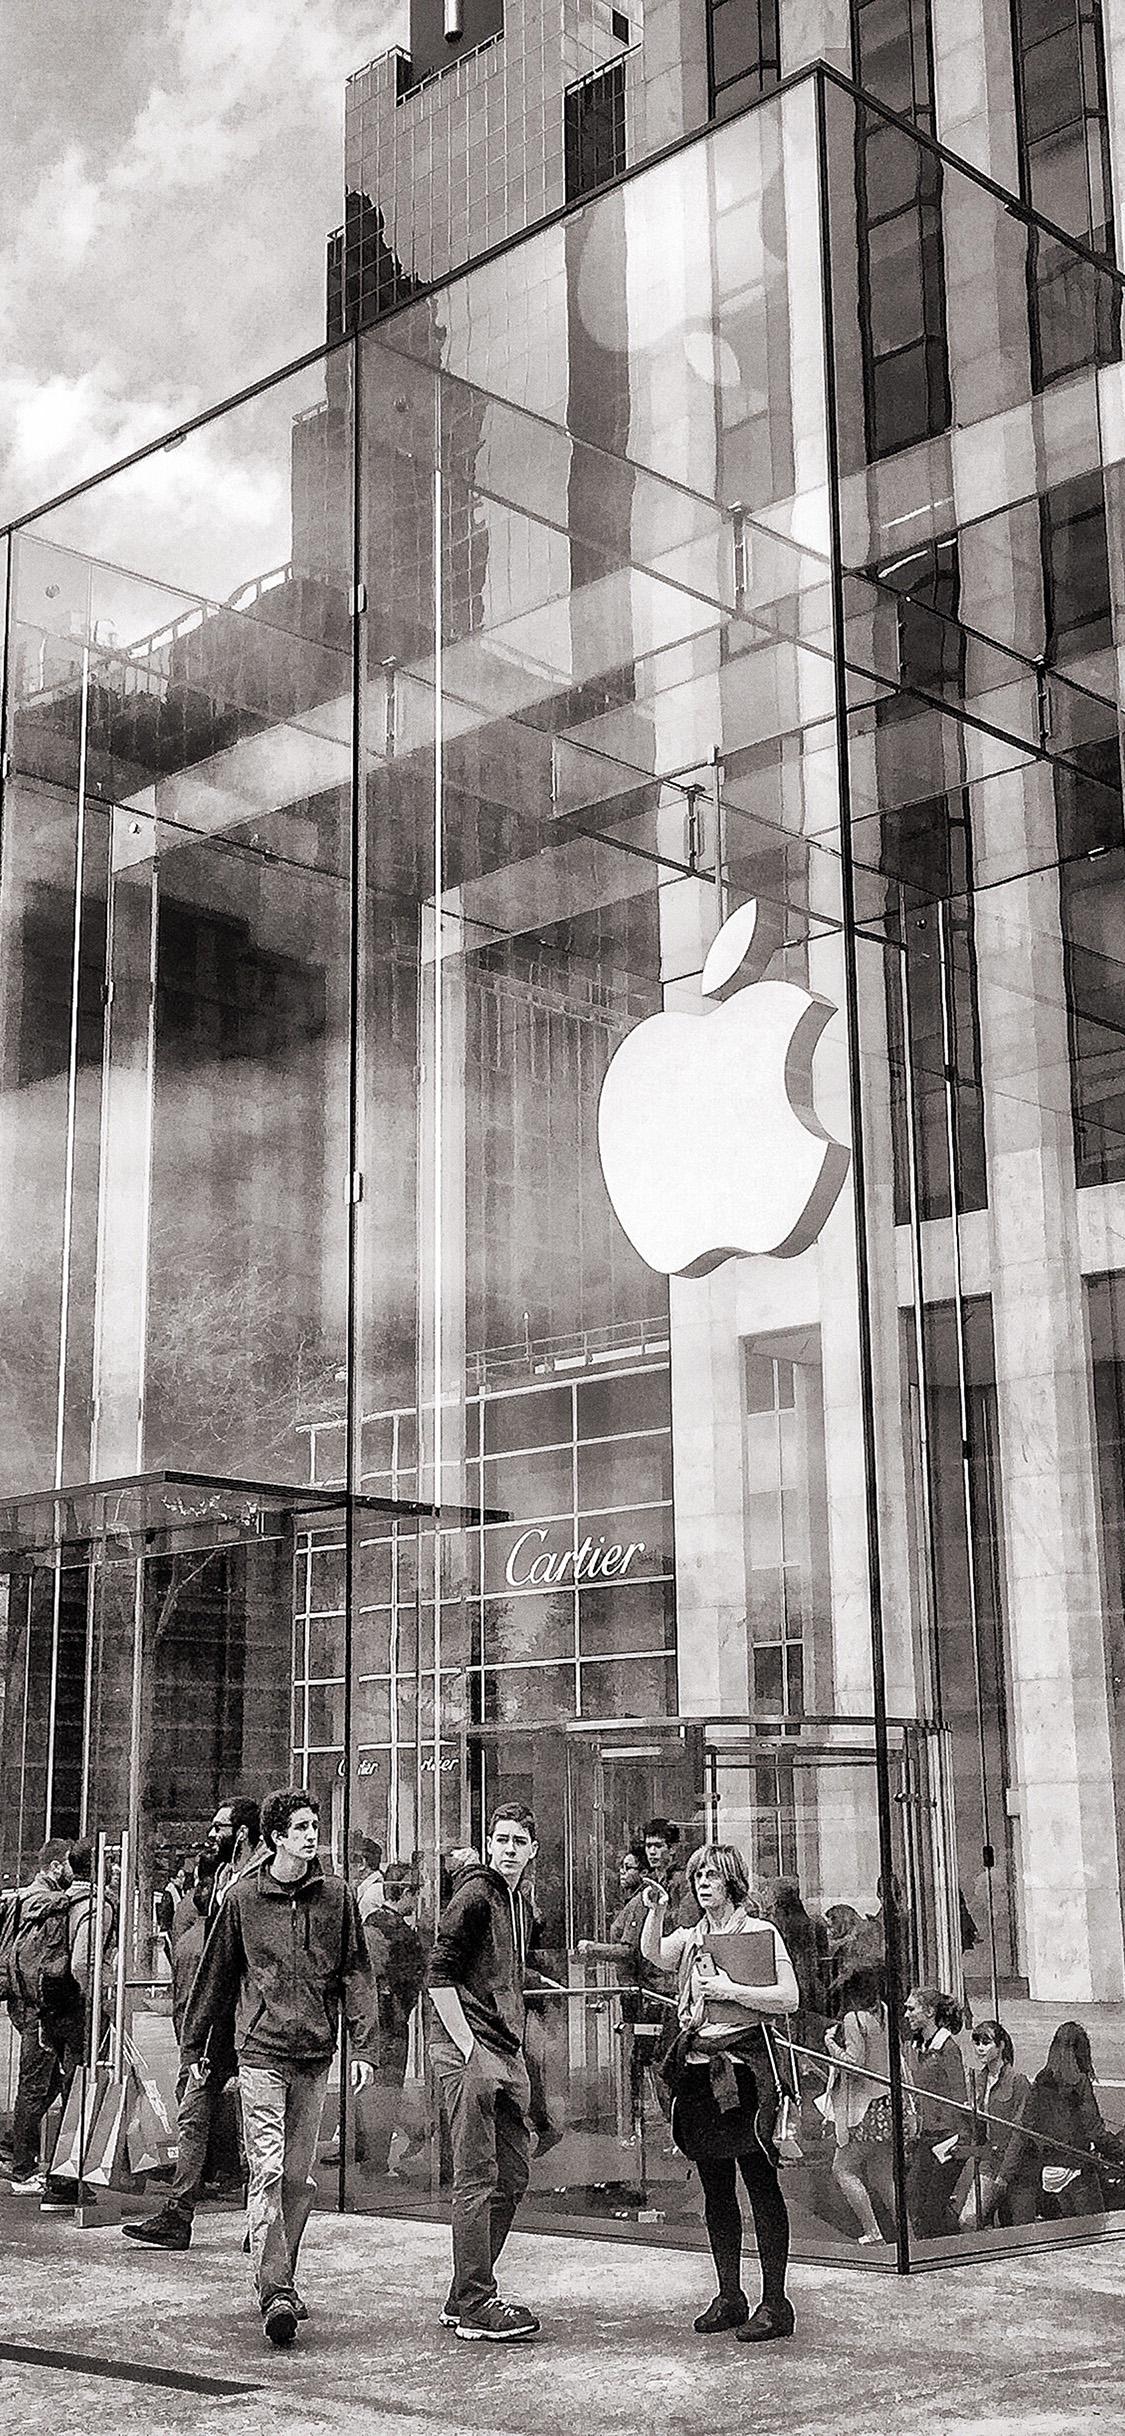 Iphonexpapers Com Iphone X Wallpaper Bl12 Art Apple Store Newyork City Bw